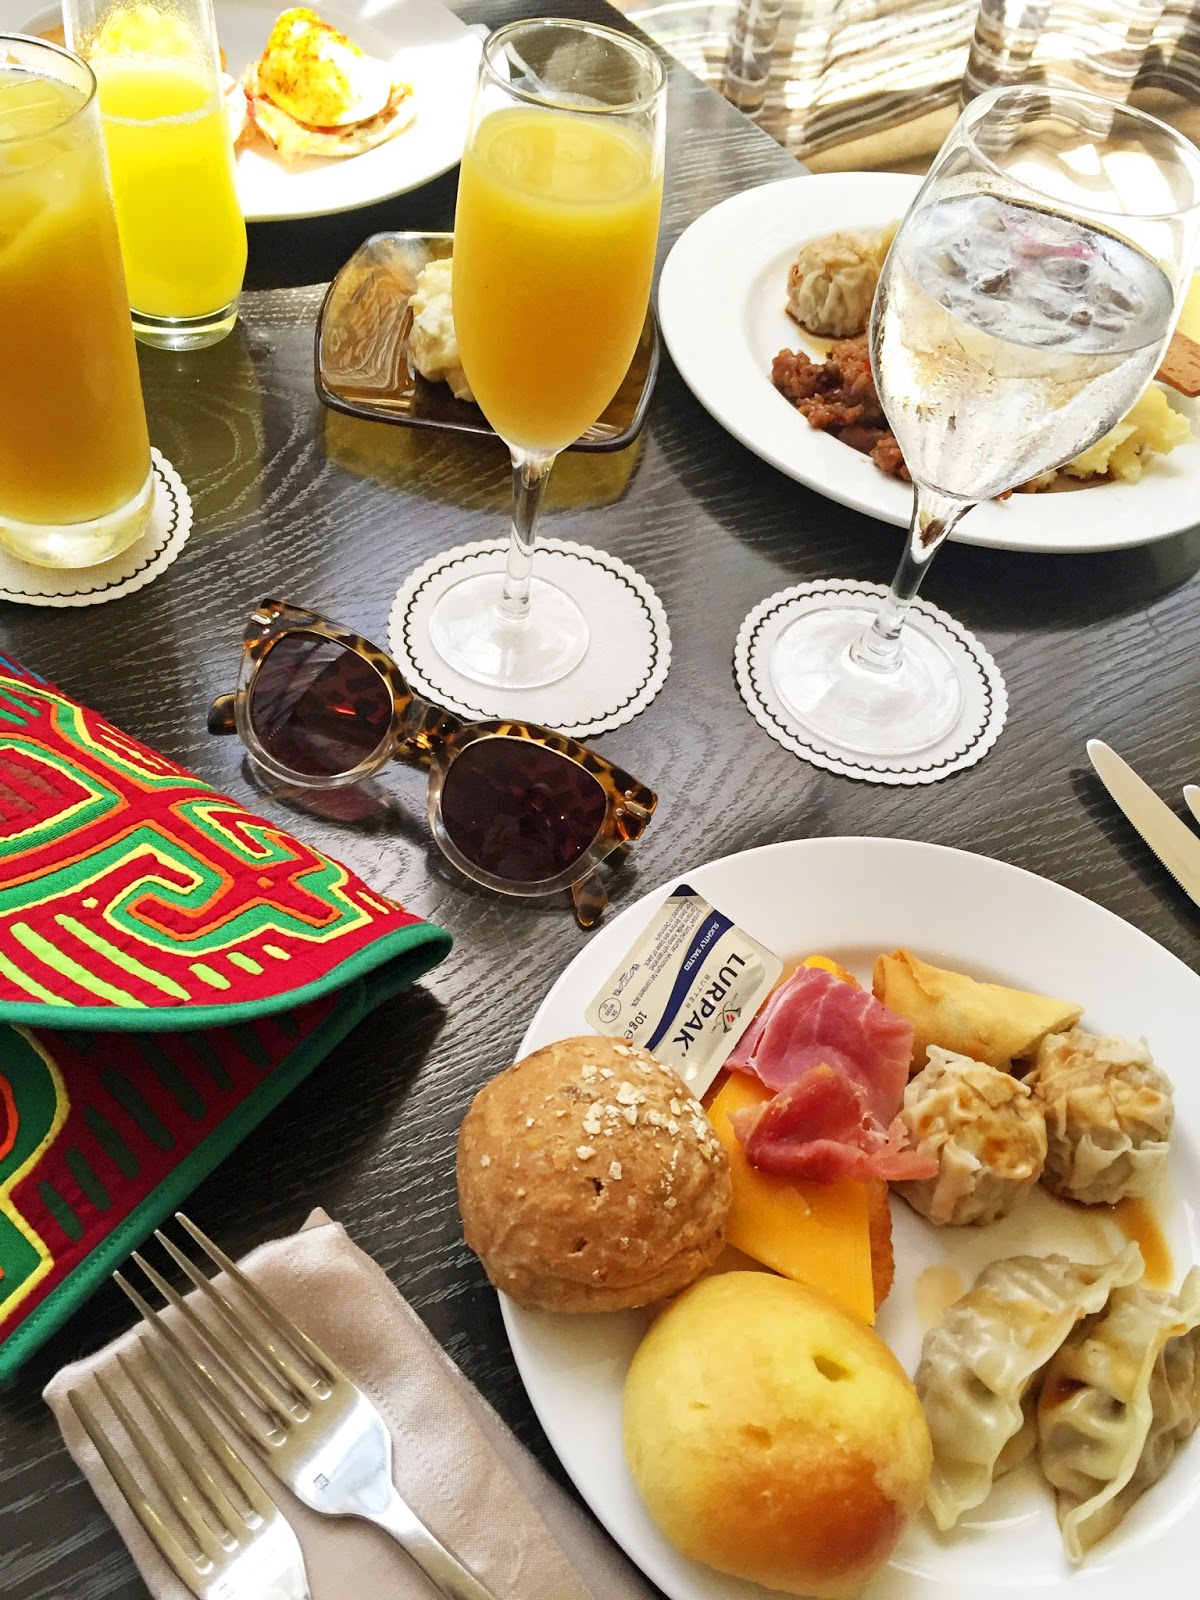 Delicious brunch at the Waldorf Astoria, Panama